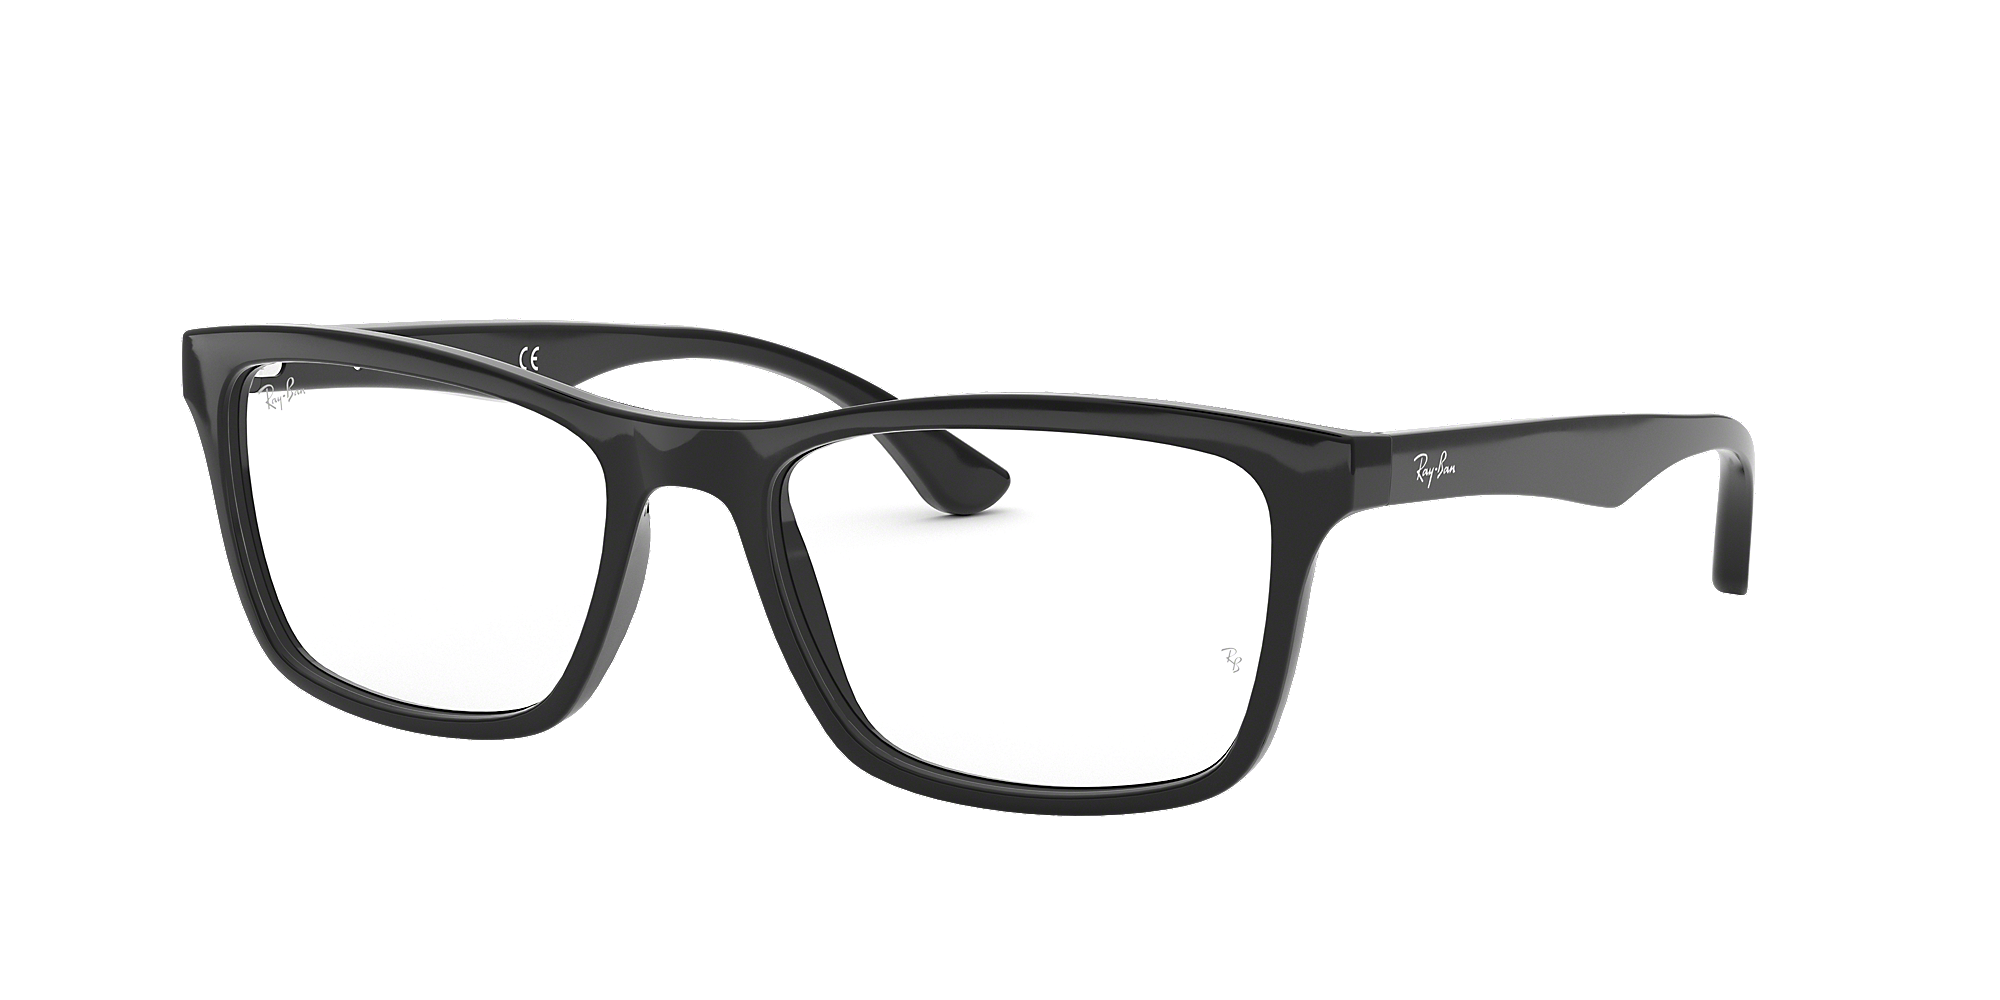 Optical Sunglasses Ray Ban